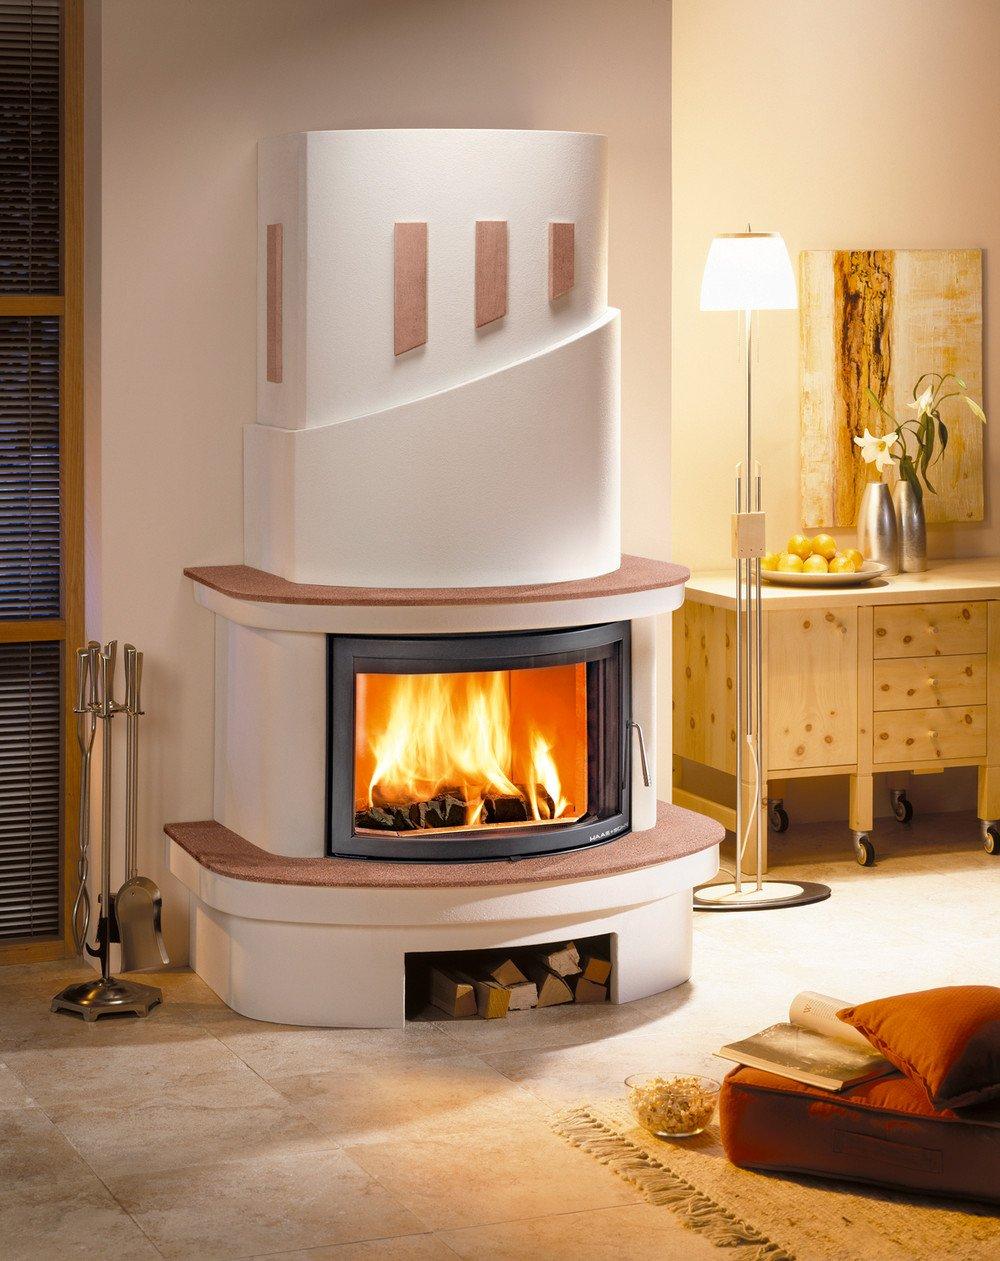 colmar kaminbausatz haas sohn deutschland. Black Bedroom Furniture Sets. Home Design Ideas